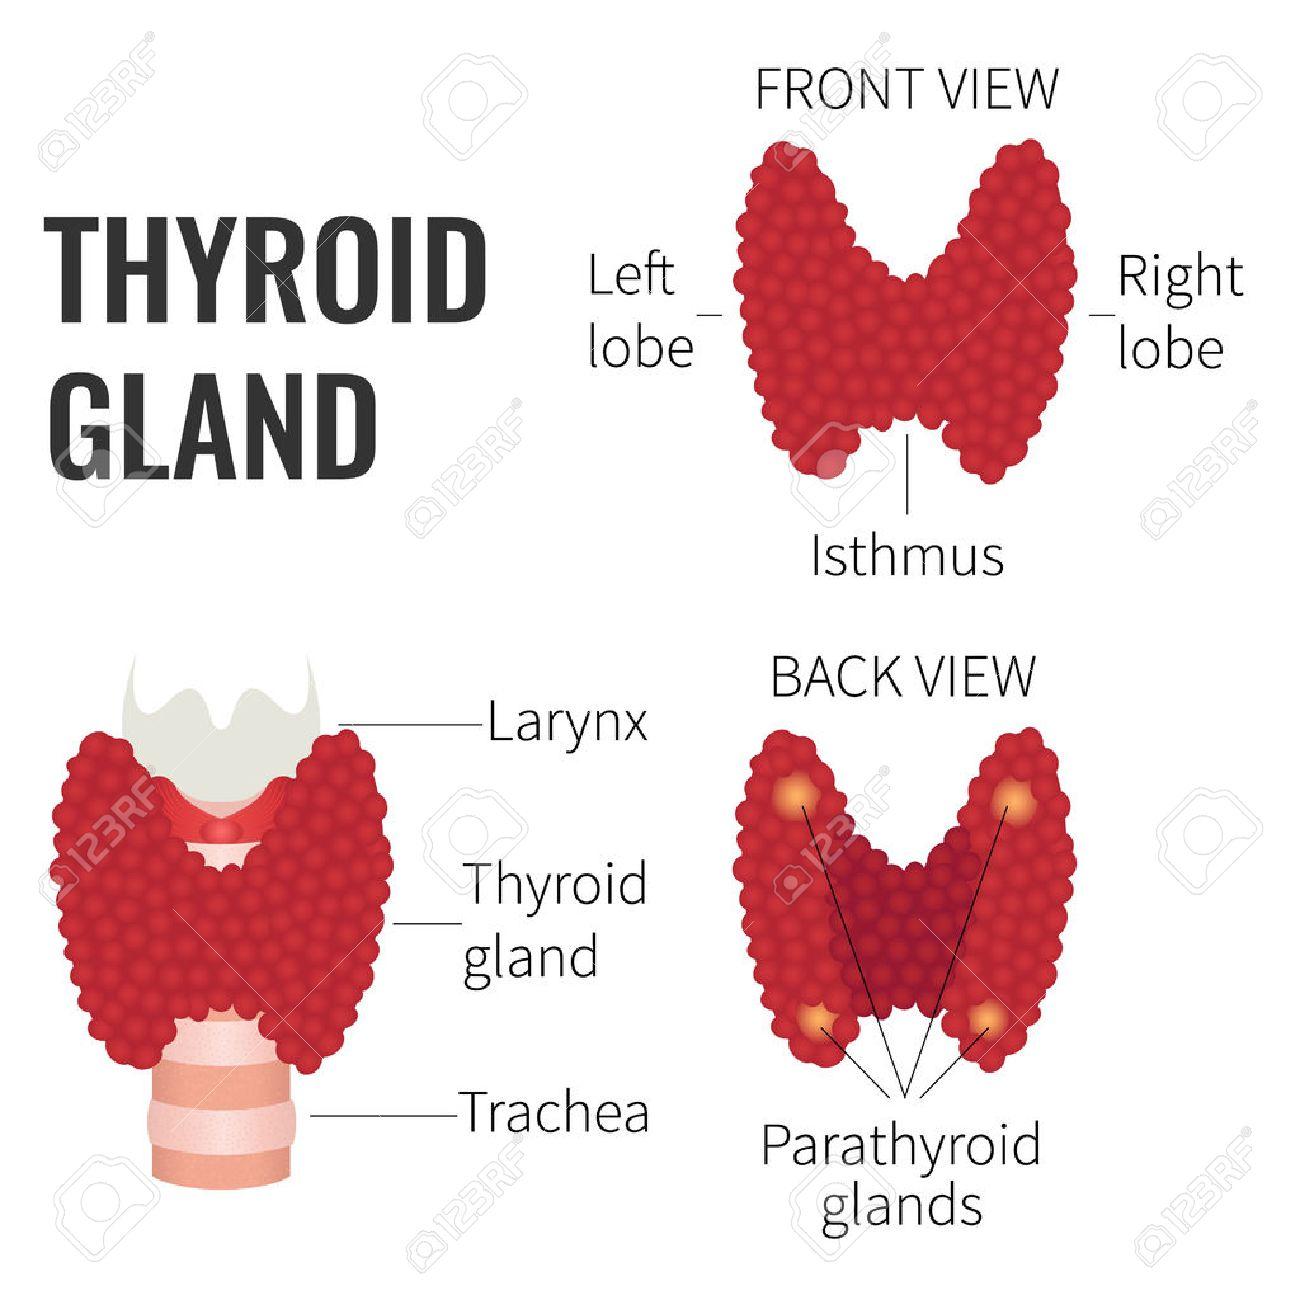 Glándula Tiroides Vista Frontal Y Posterior Sobre Fondo Blanco ...